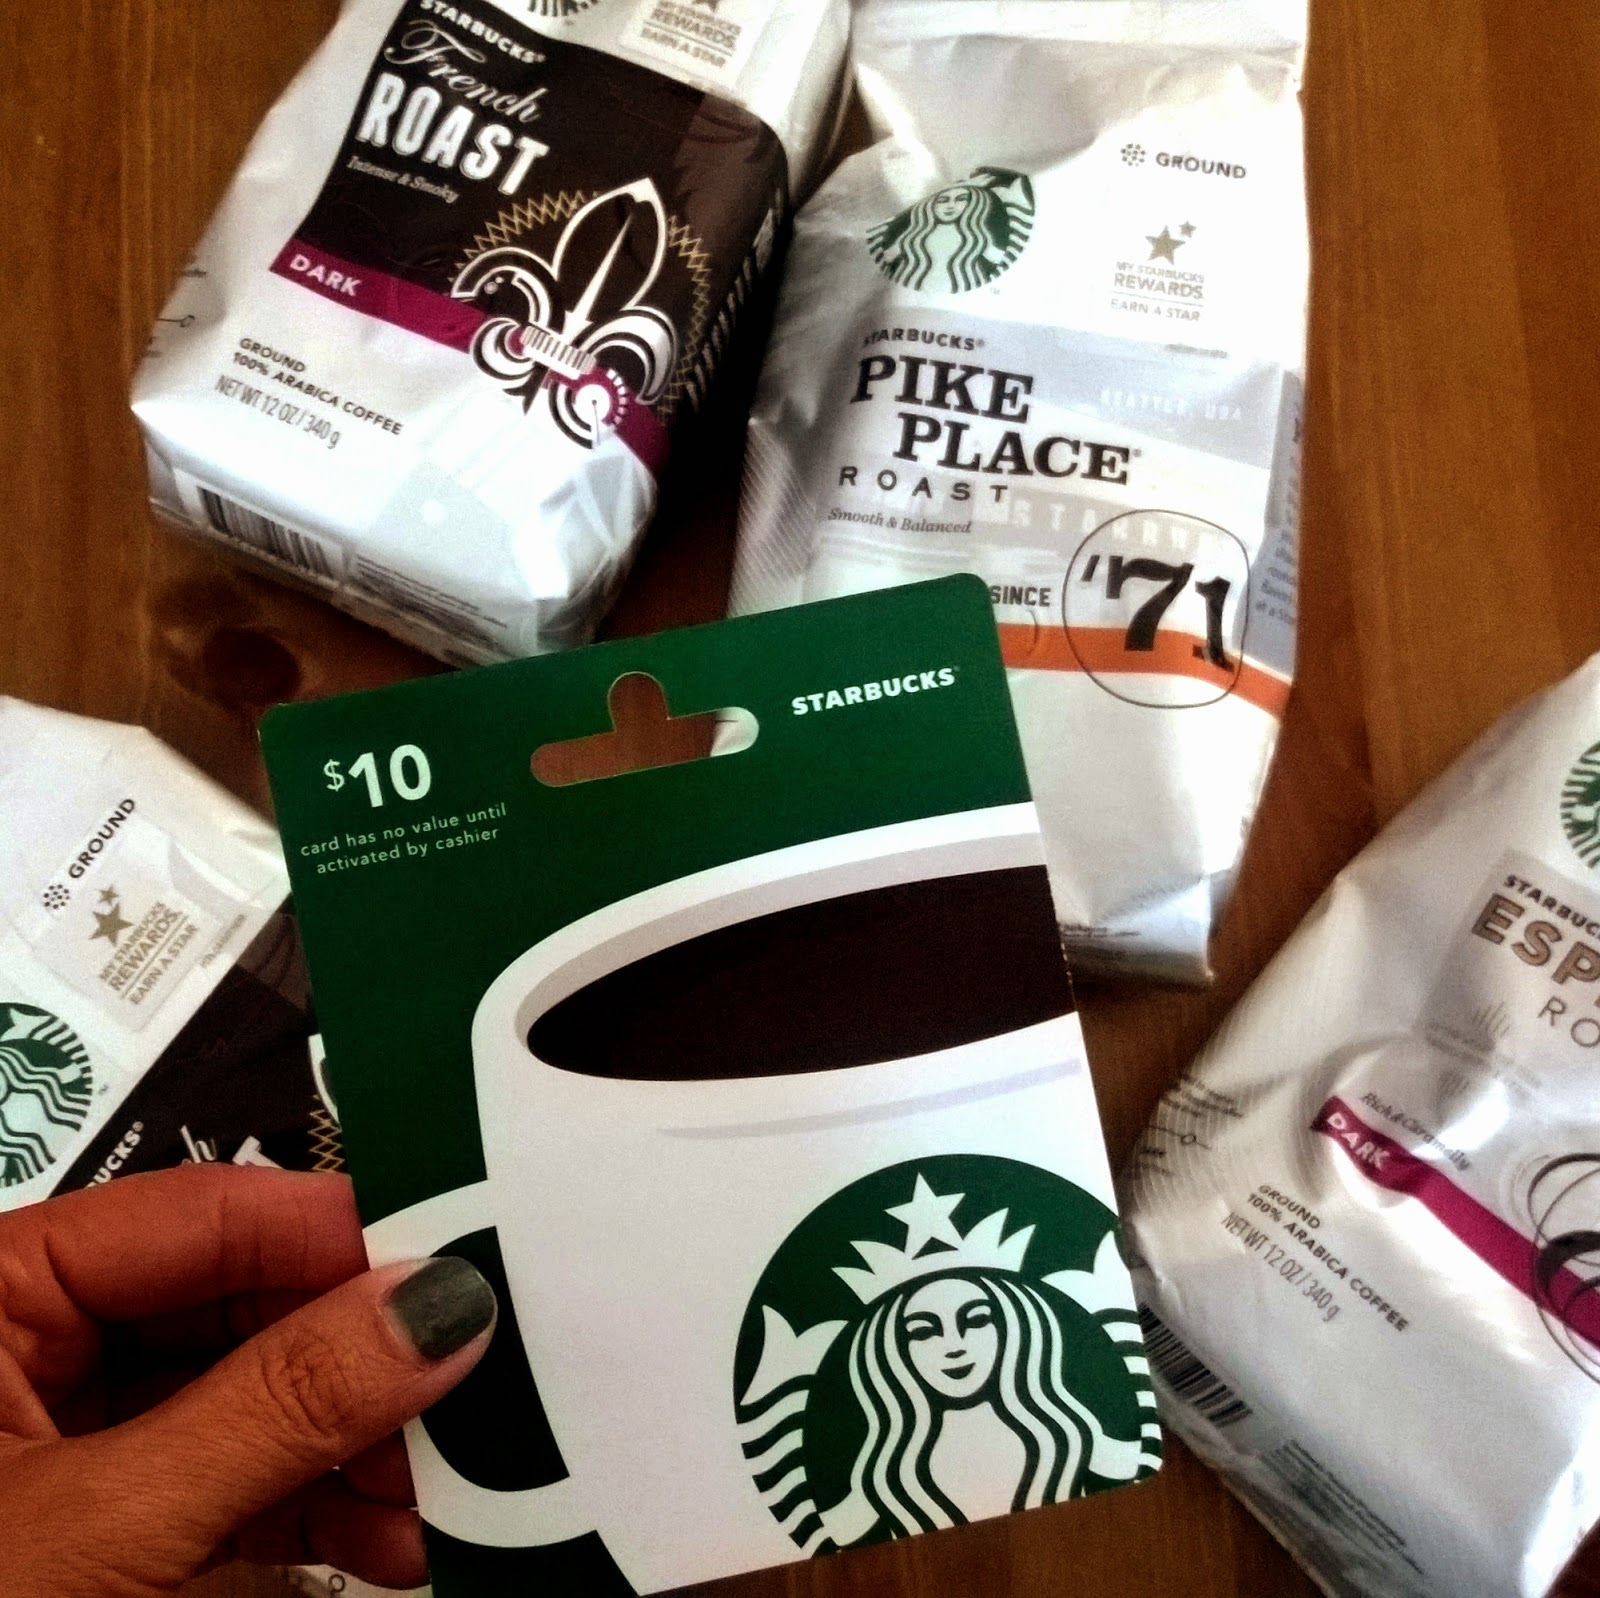 Starbucks variety at Target